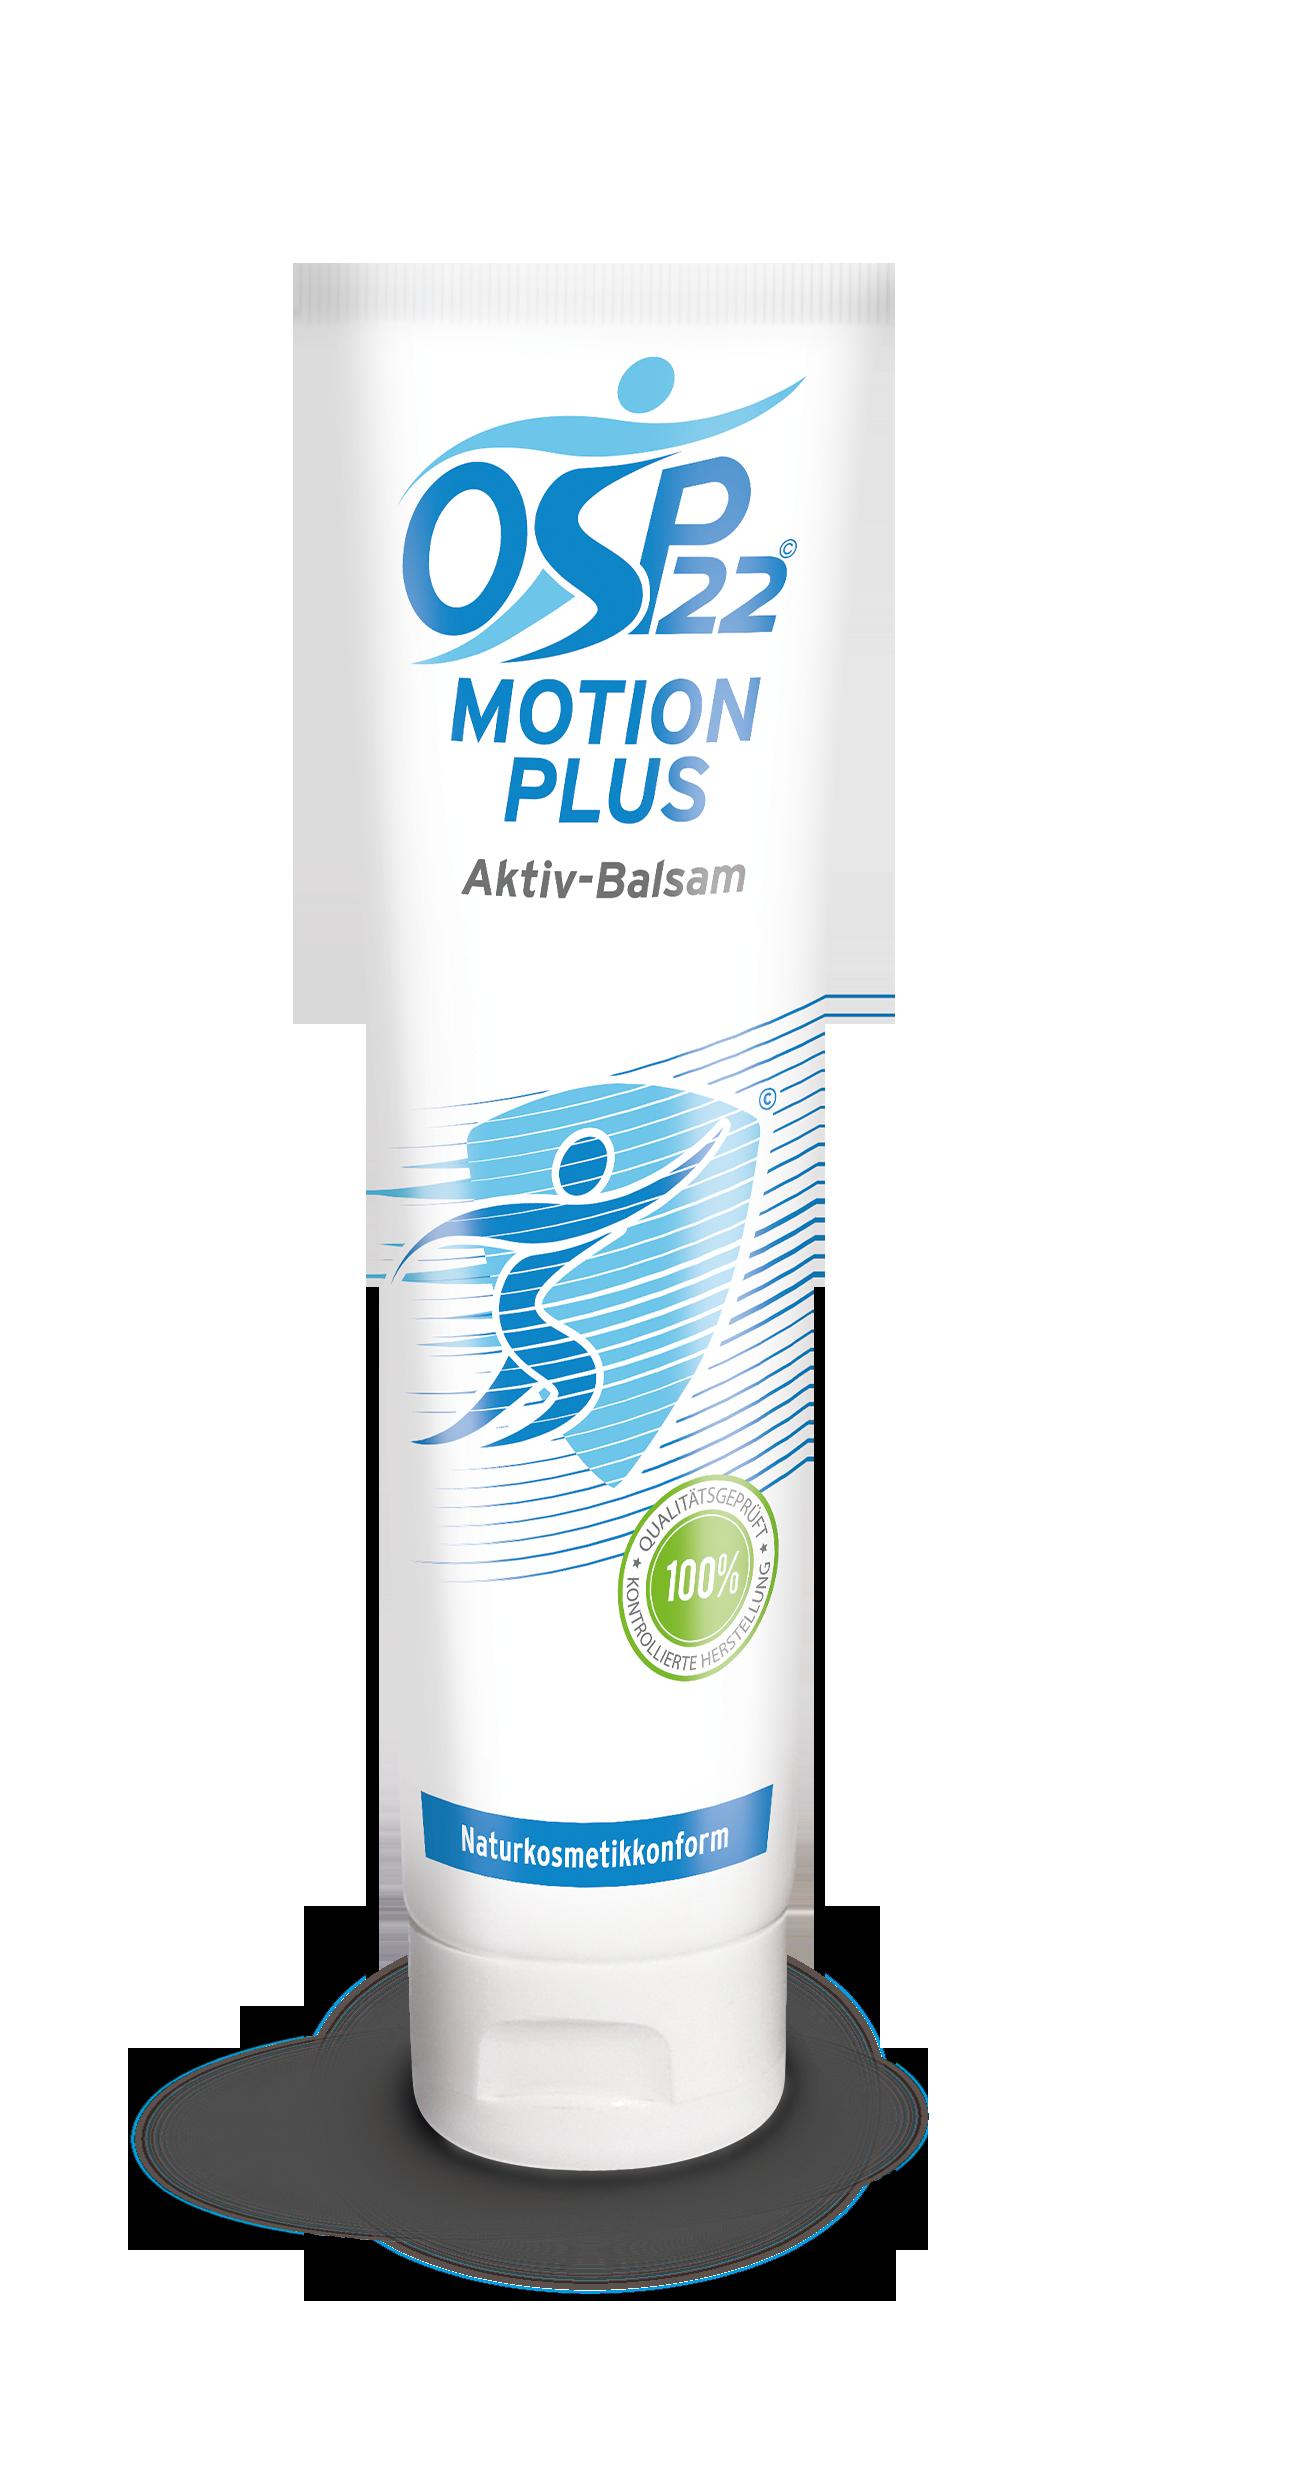 OSP22® - Motion Plus Aktiv Balsam